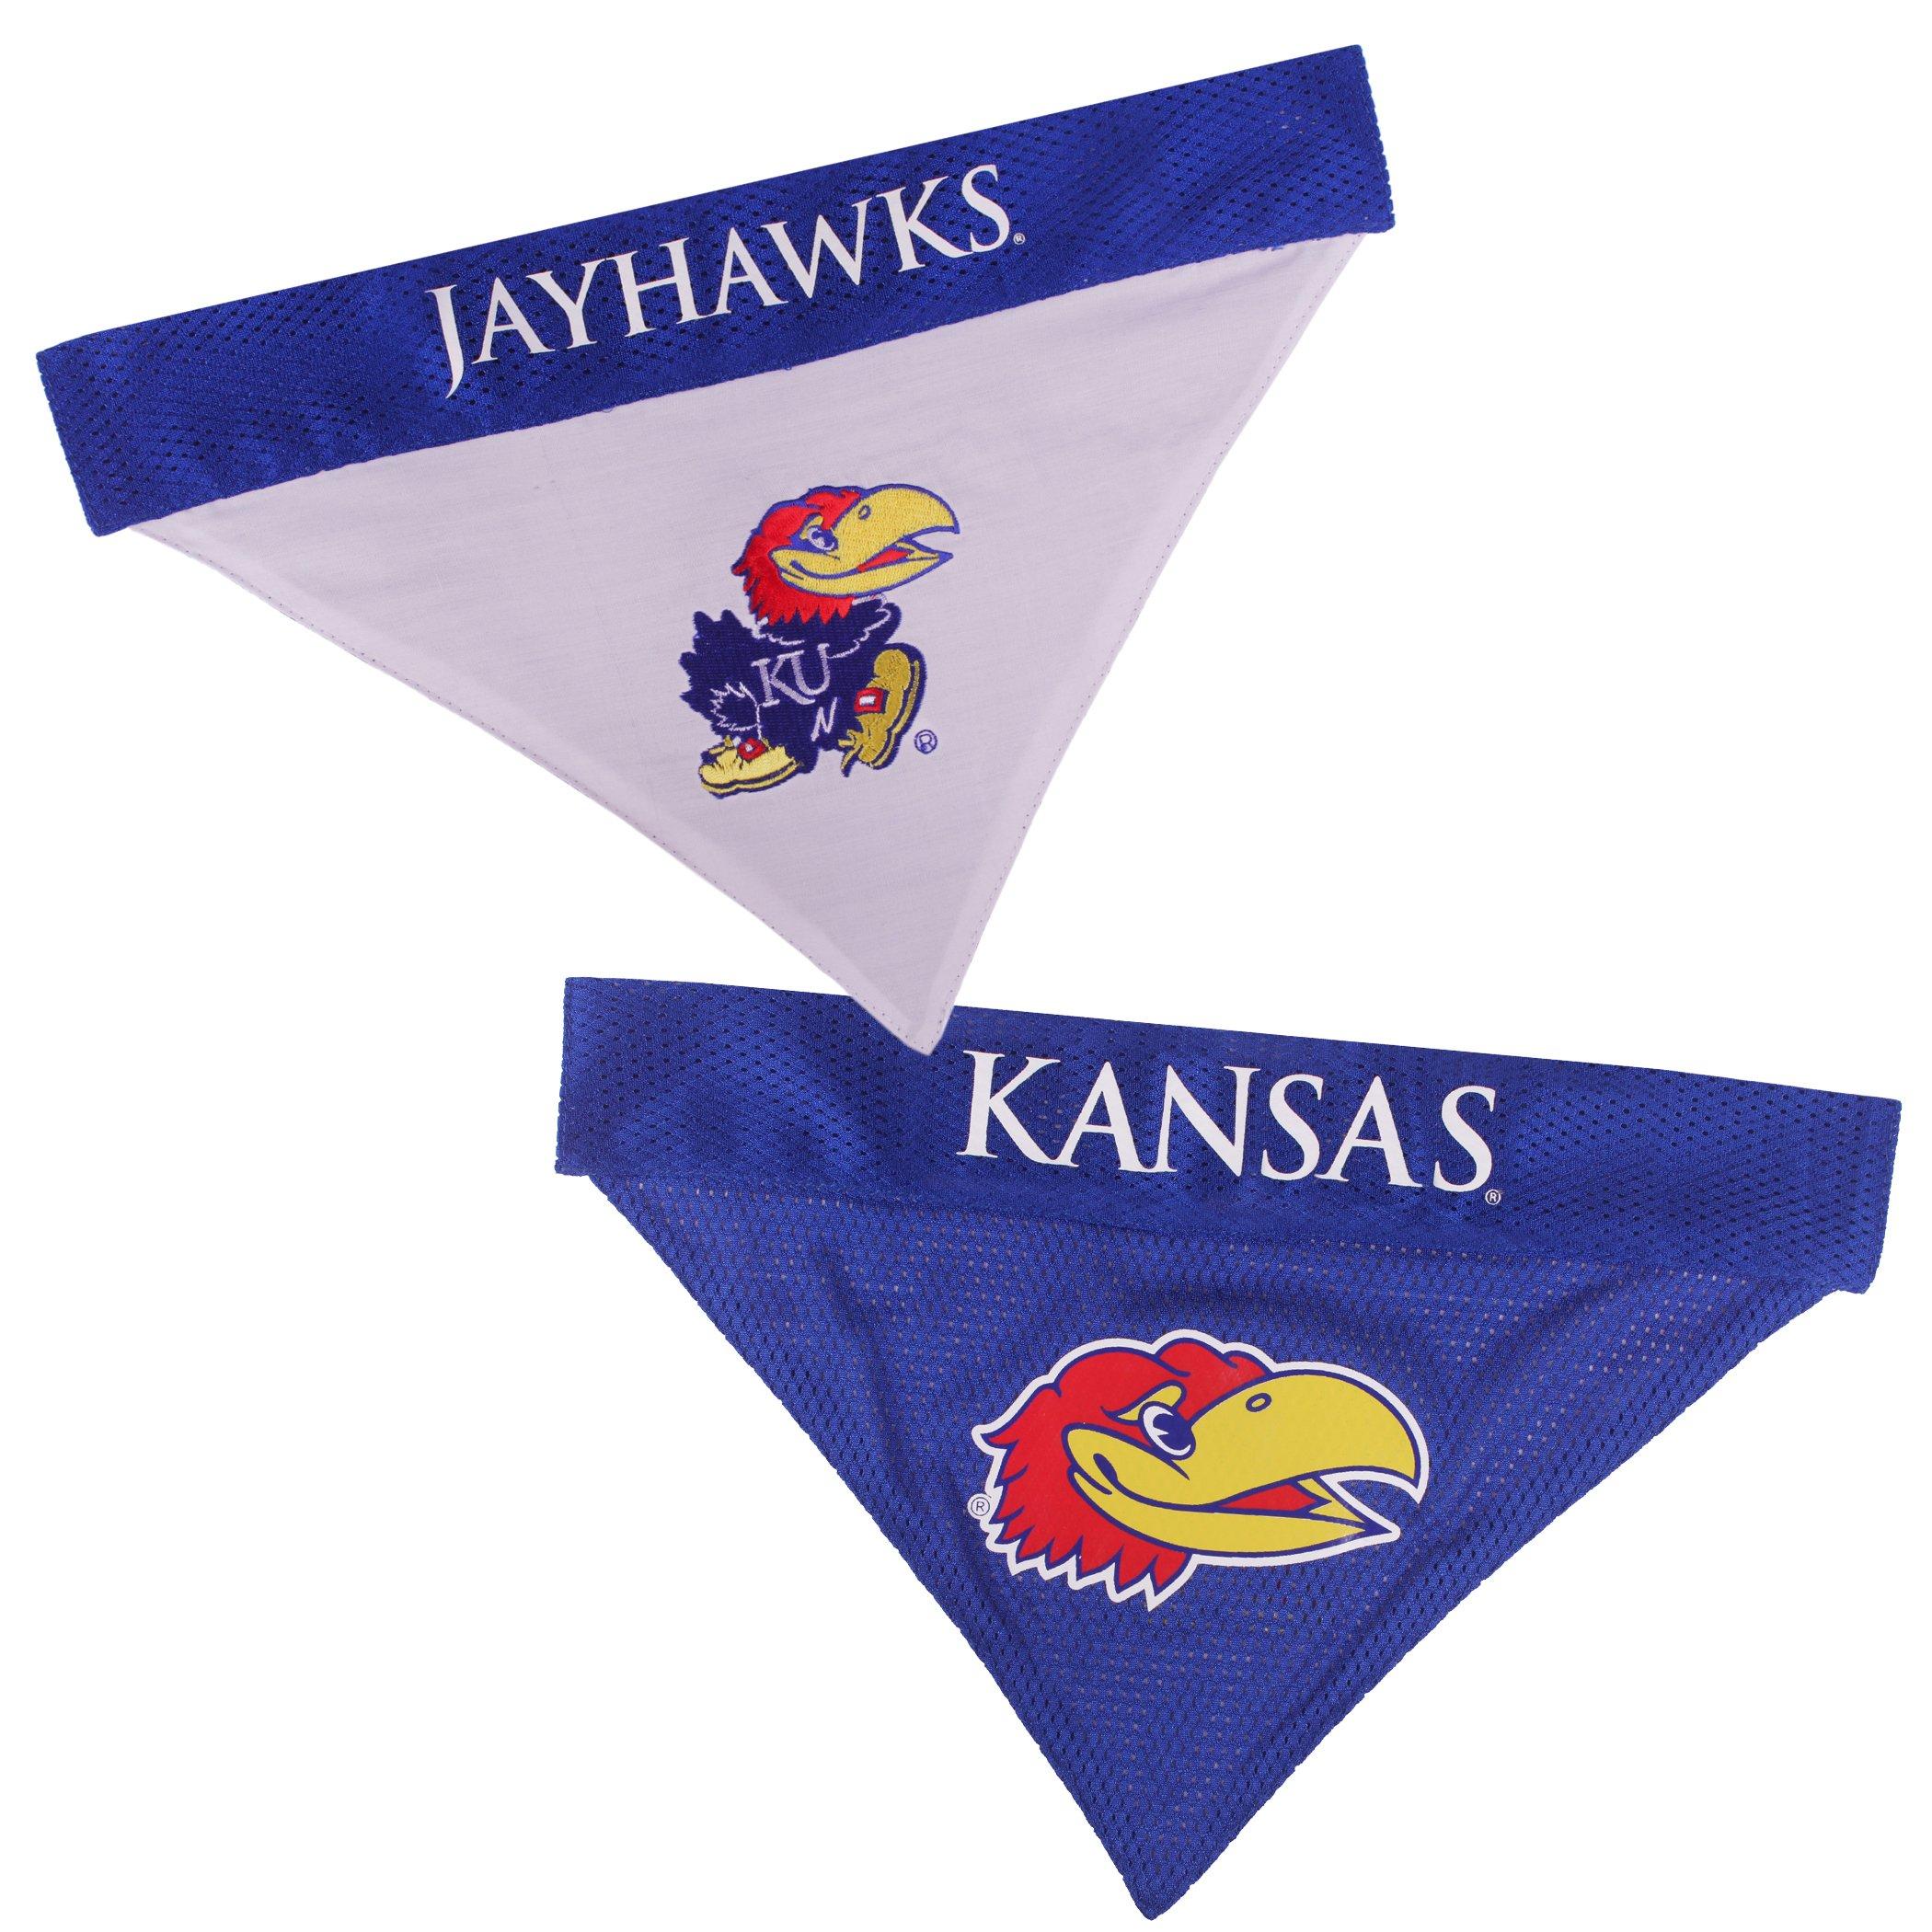 Pets First Collegiate Pet Accessories, Reversible Bandana, Kansas Jayhawks, Large/X-Large